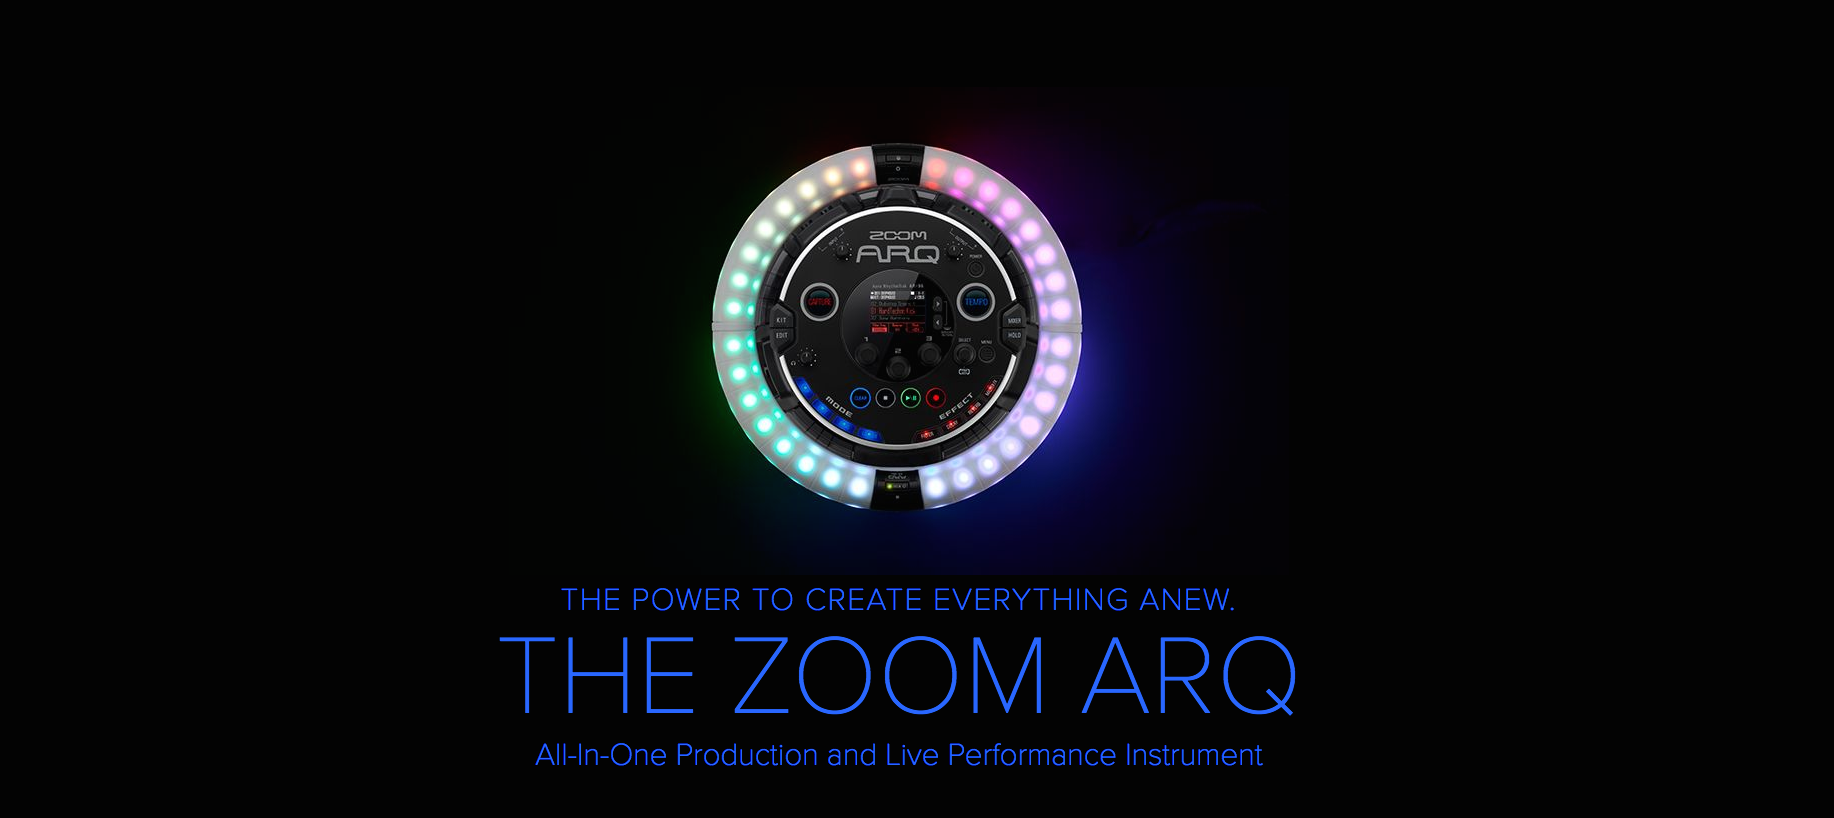 Zoom ARQ